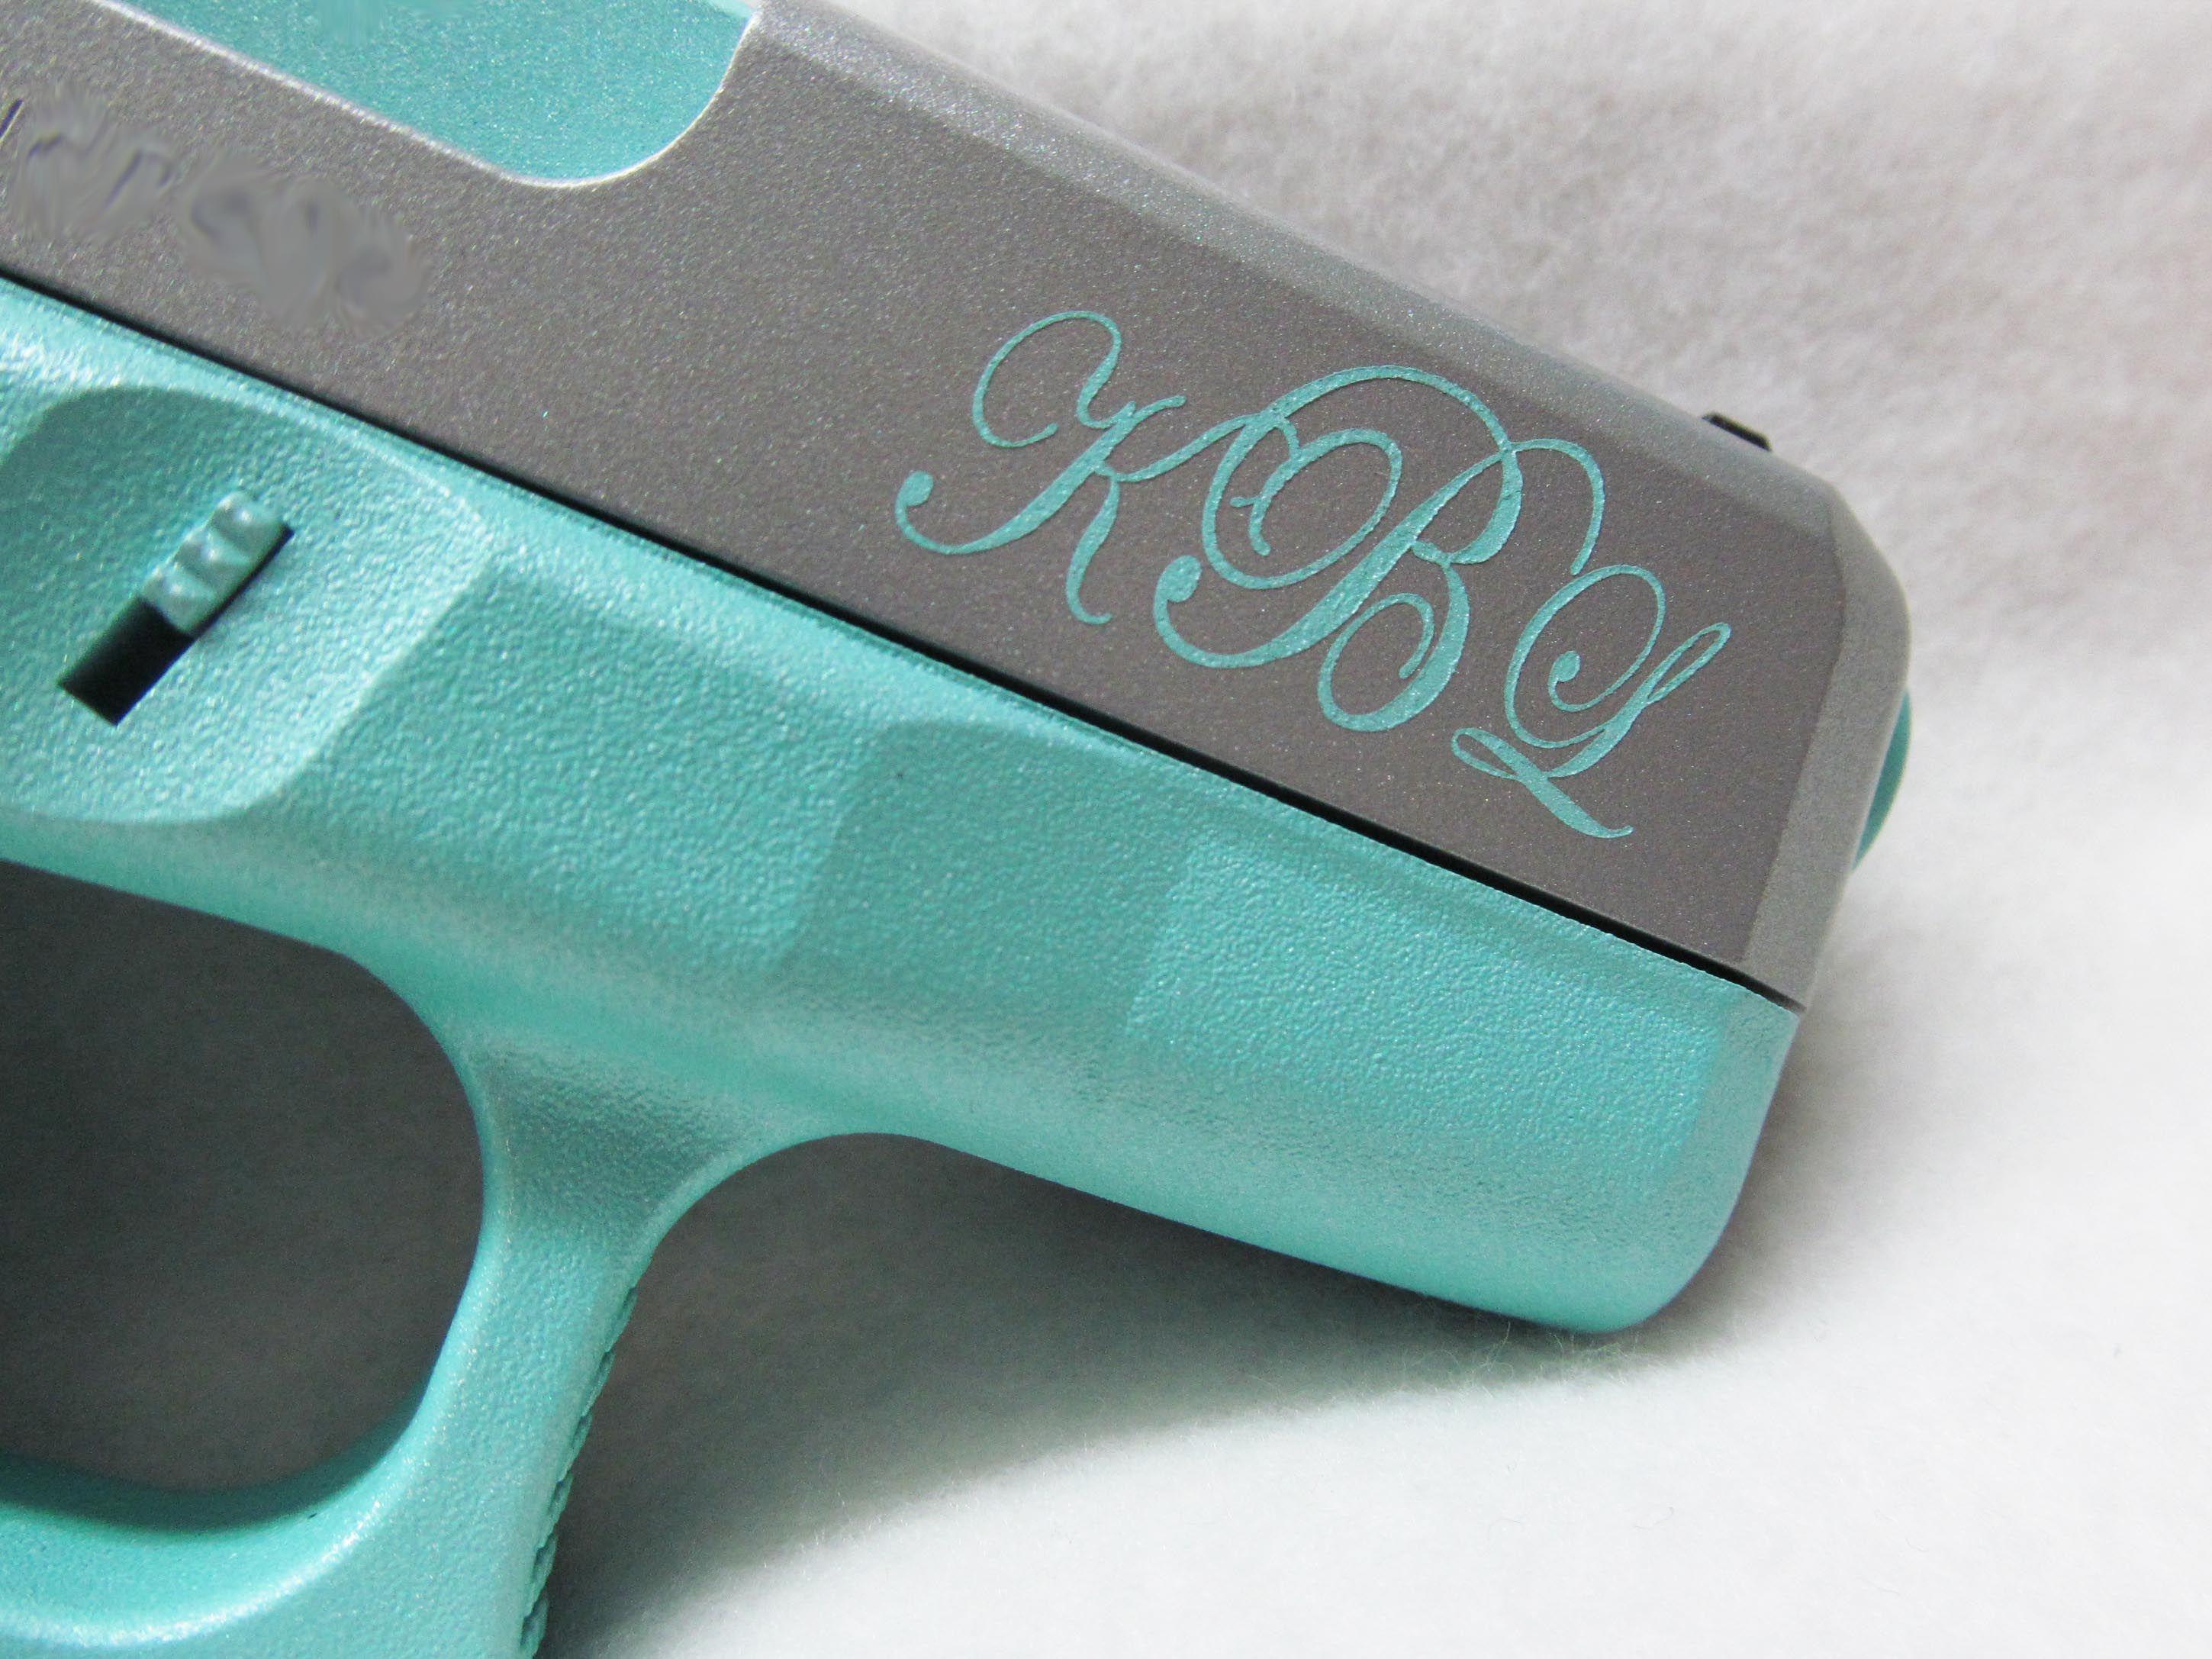 Image Raw 2899 2174 Guns Pretty Guns Monogram